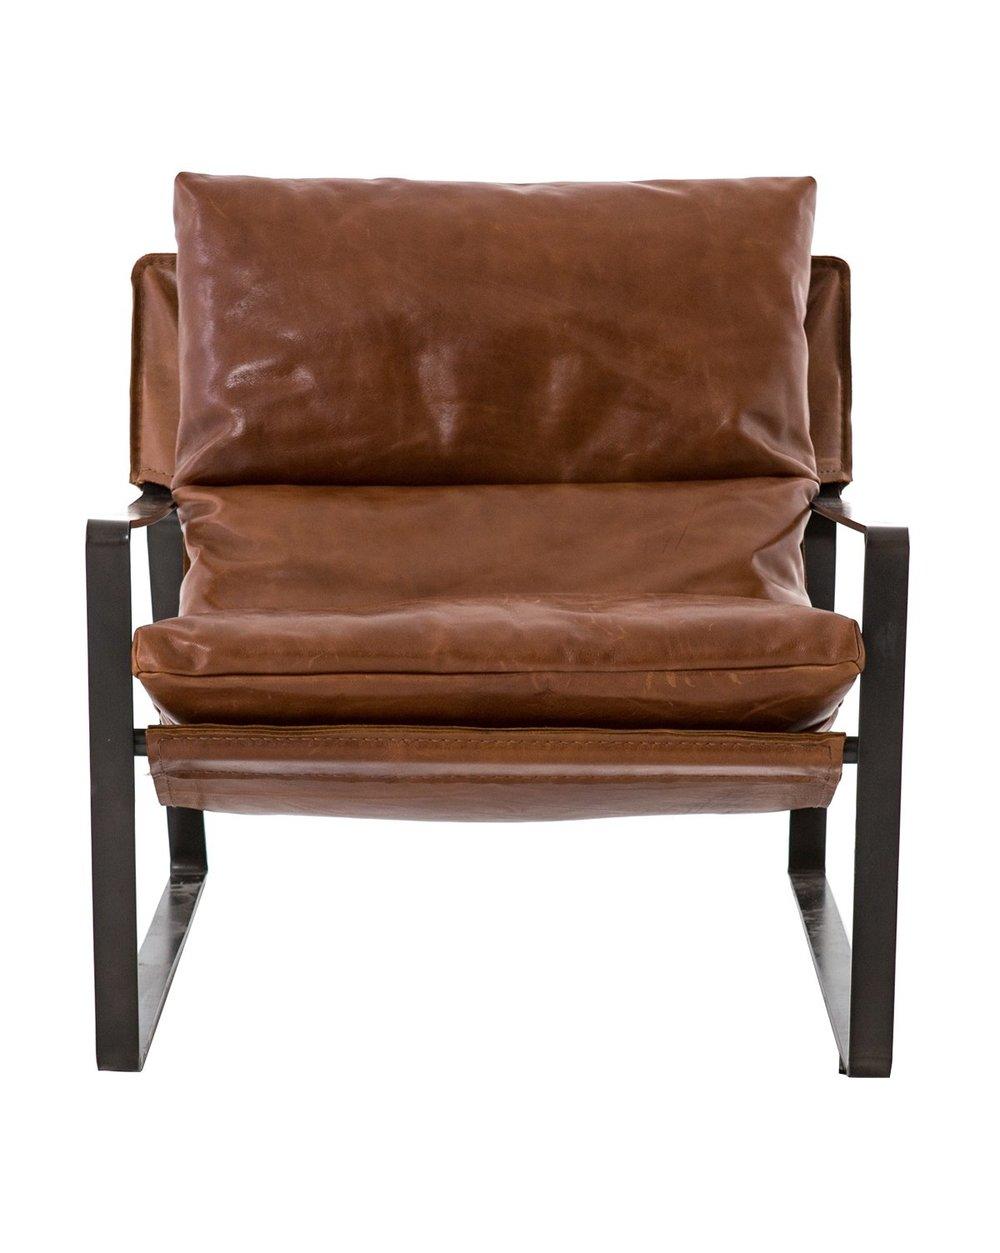 Peyton_Chair_Tobbaco_3_3c2a30b0-1d30-4877-b0f9-db158929f28b.jpg